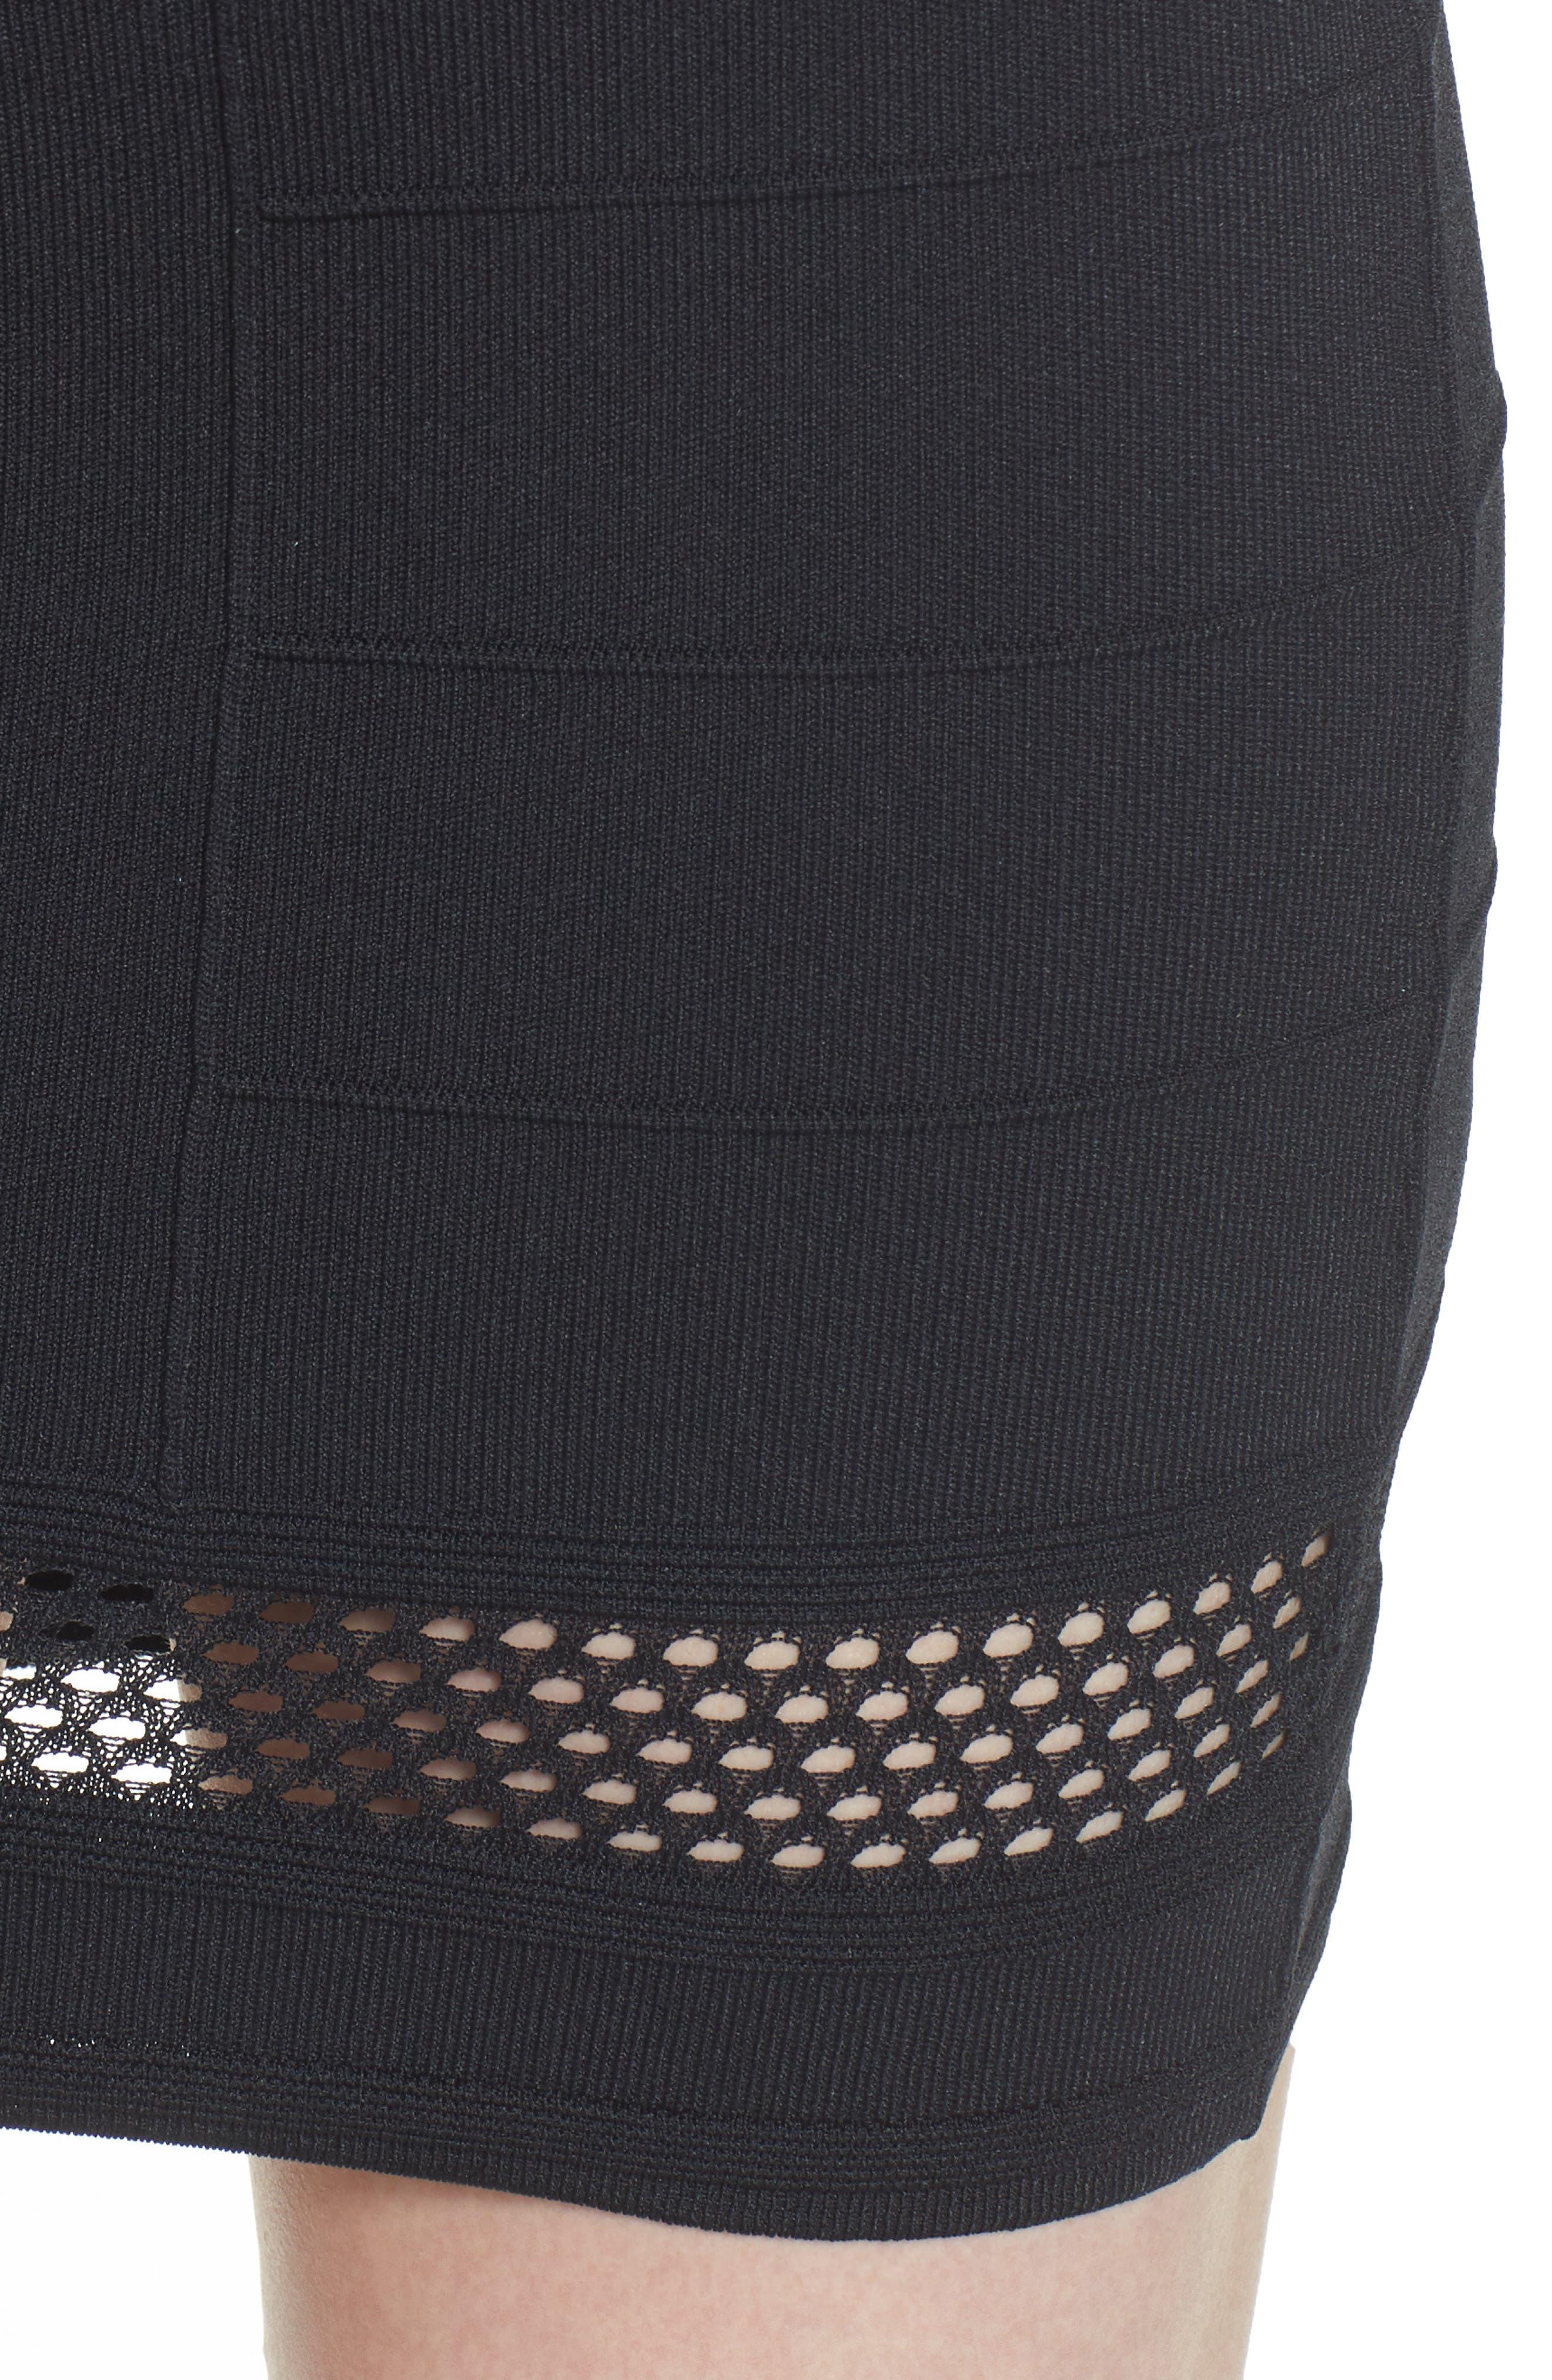 Bishop + Young Siena Peekaboo Skirt,                             Alternate thumbnail 4, color,                             Black